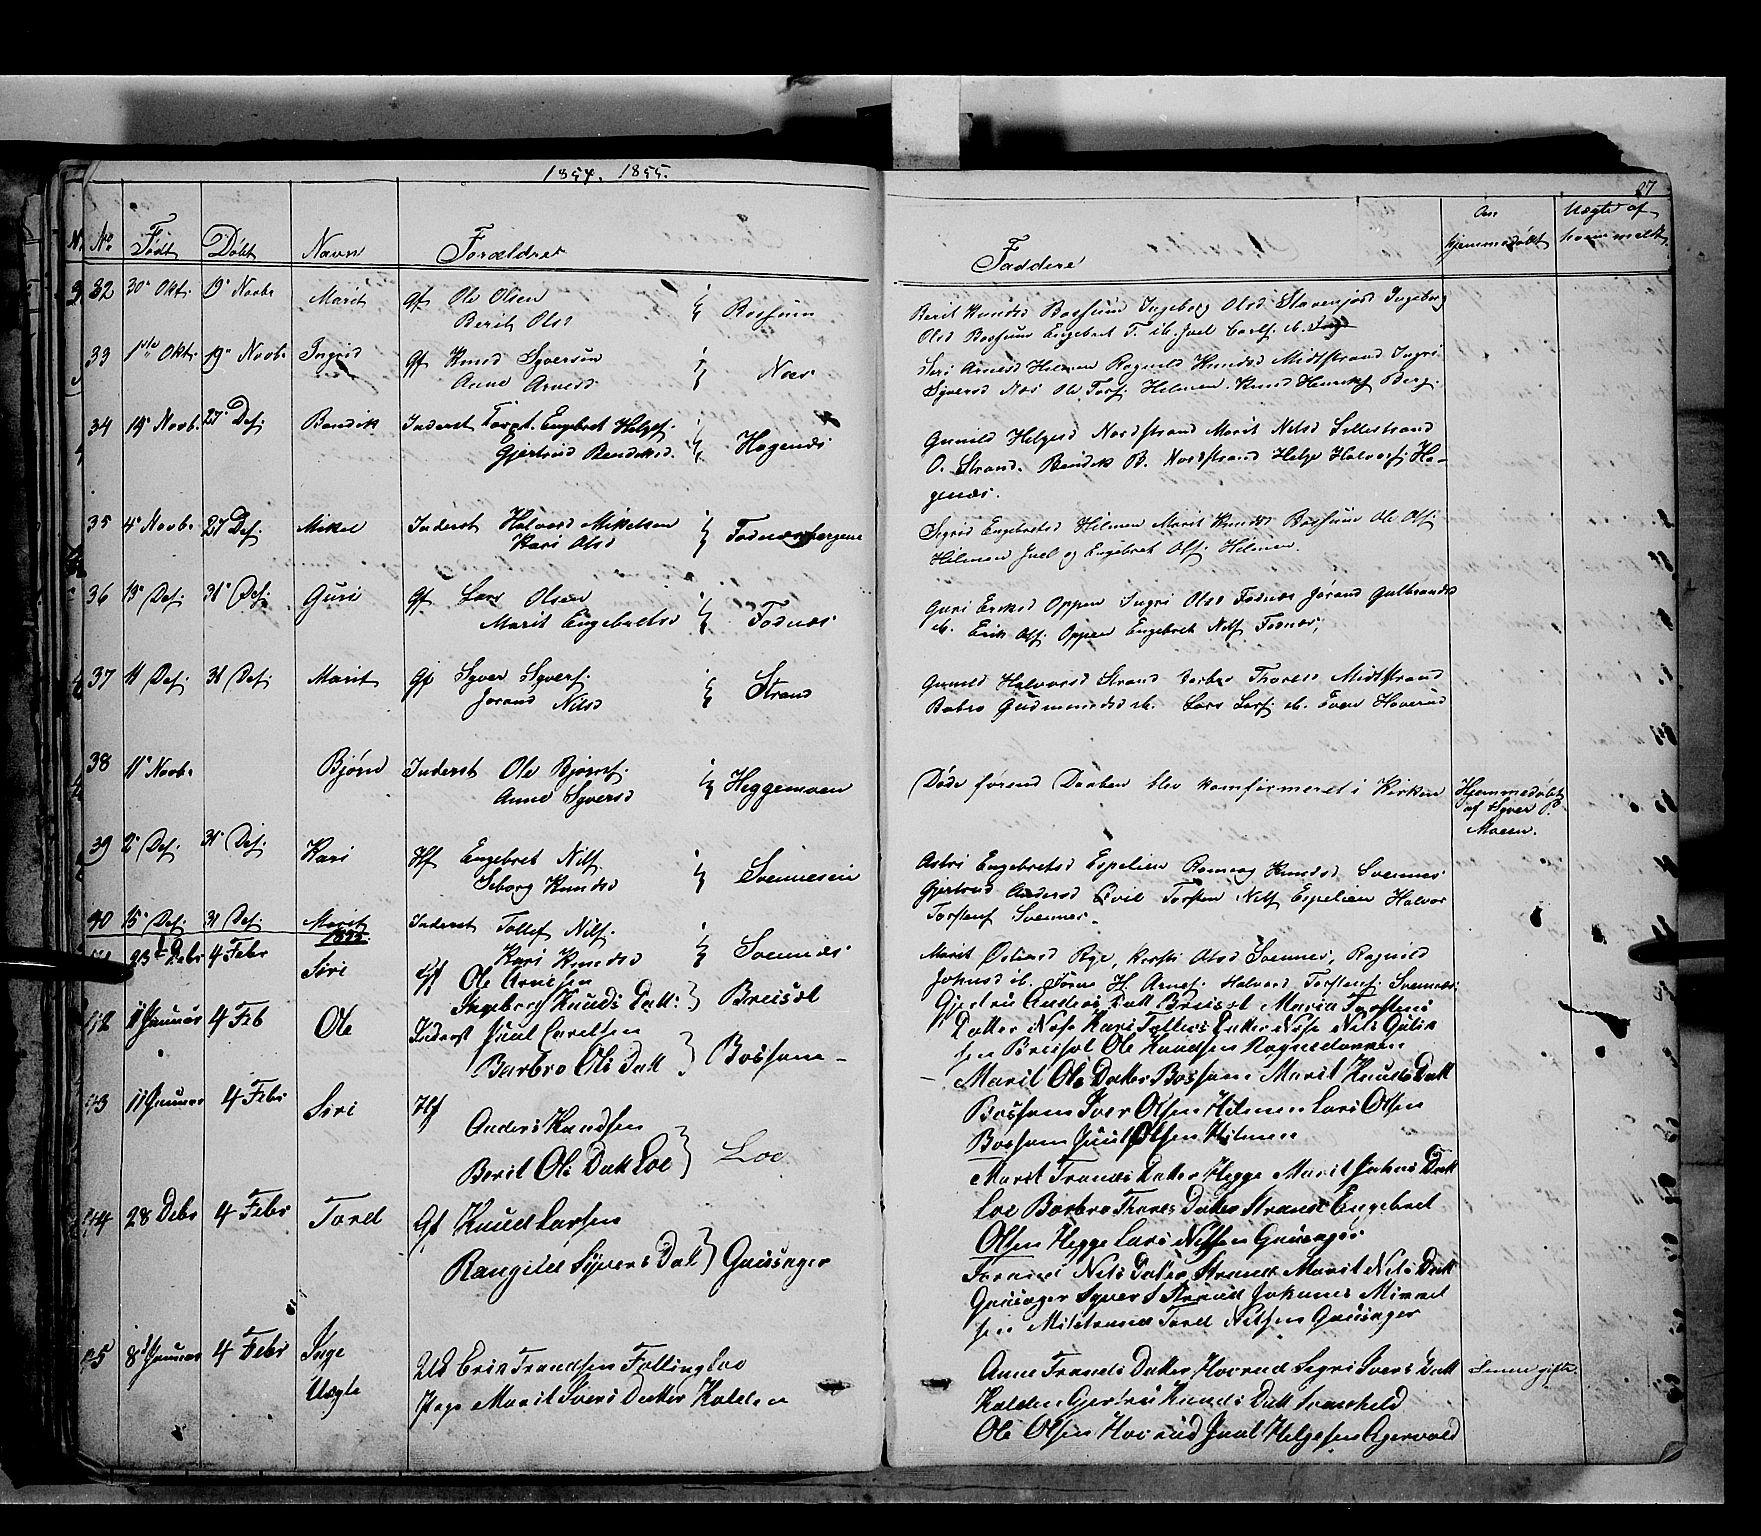 SAH, Nord-Aurdal prestekontor, Ministerialbok nr. 5, 1842-1863, s. 27